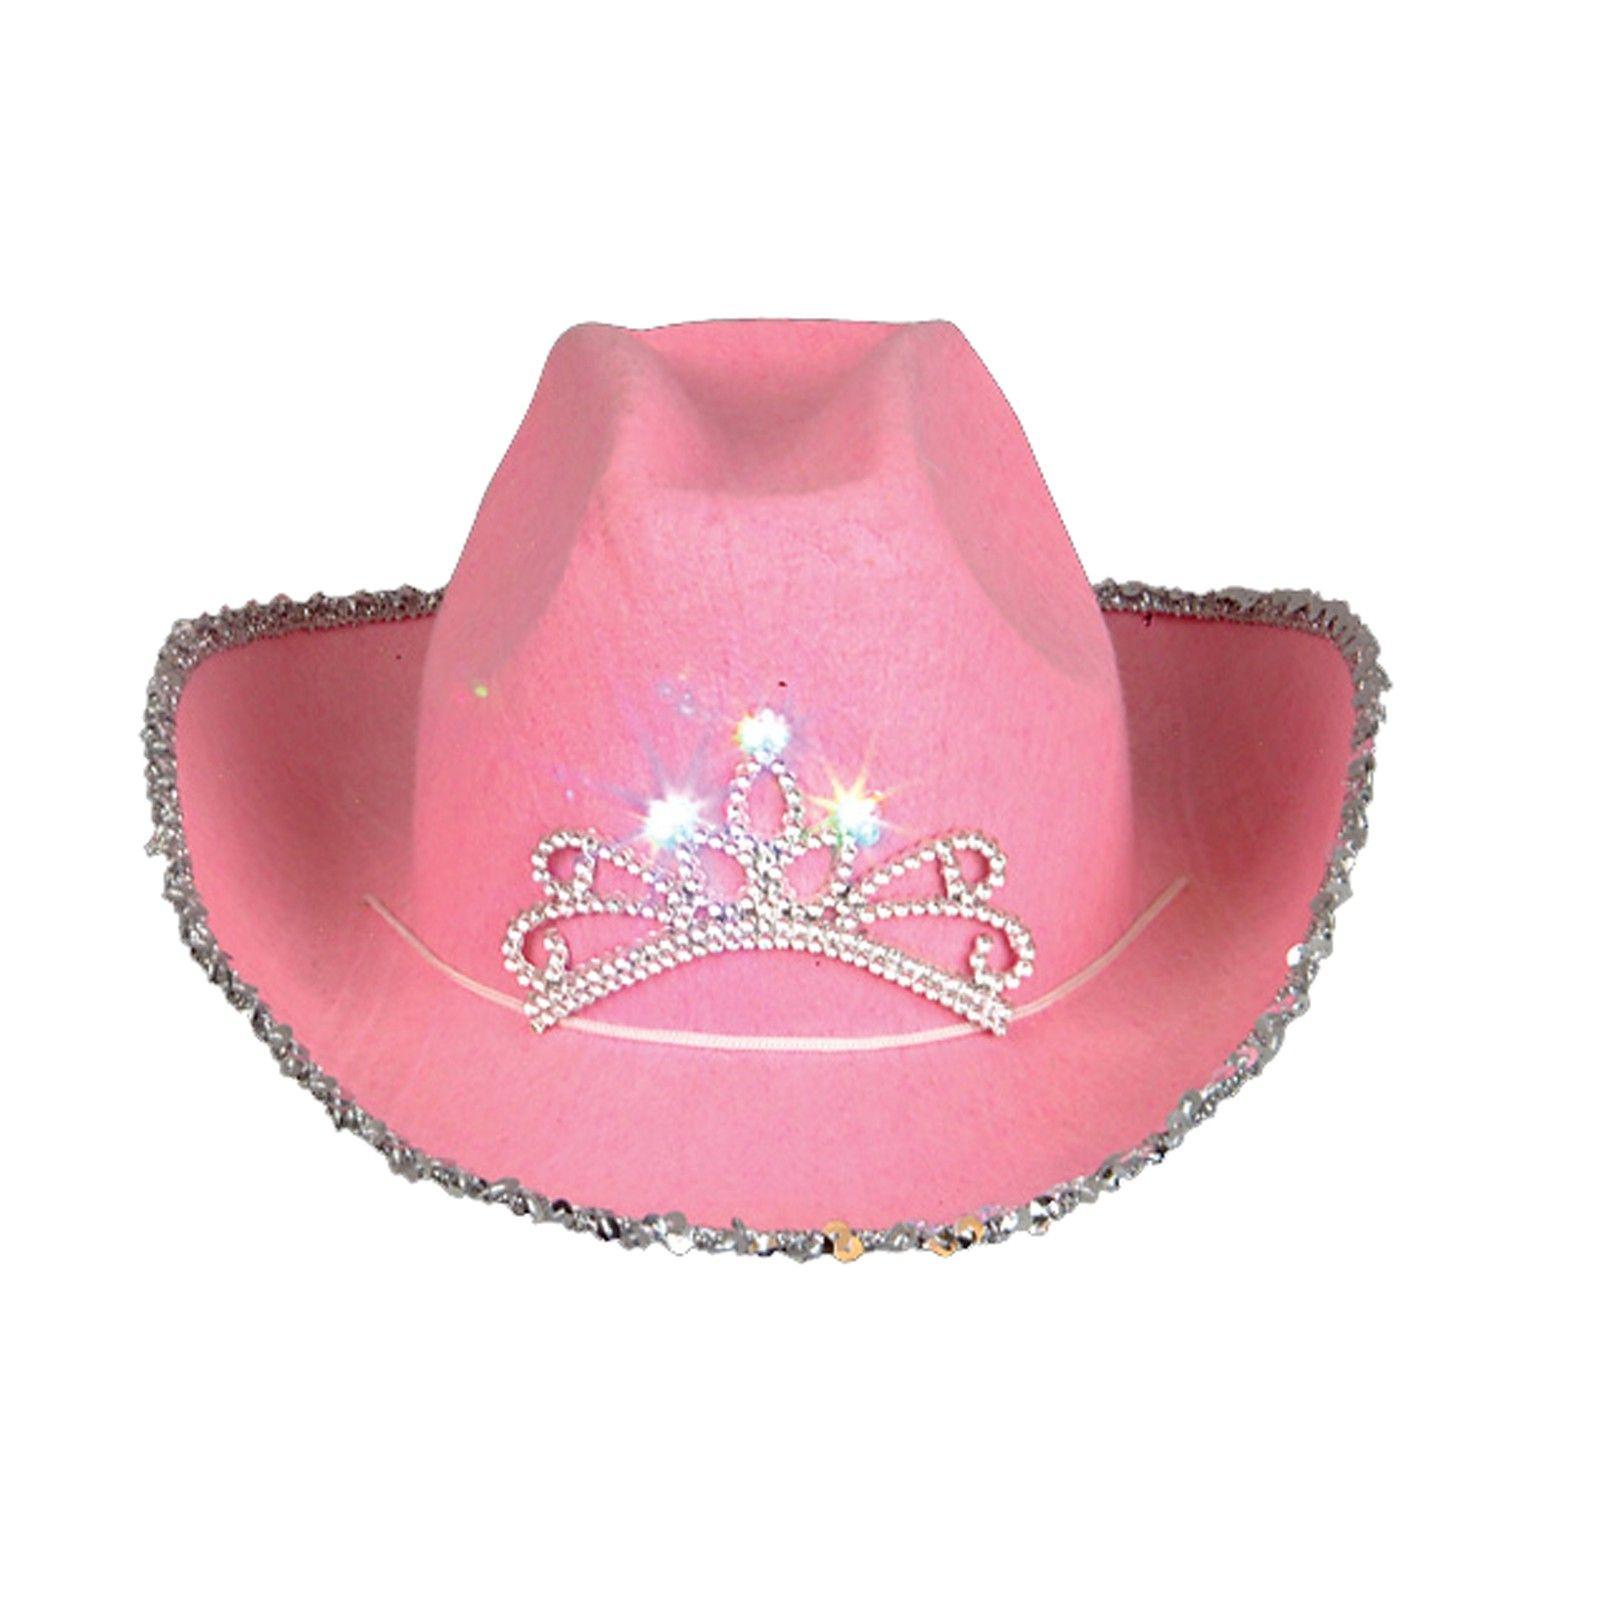 Blinking Pink Tiara Cowboy Hat (Child)  82e23d1a426c